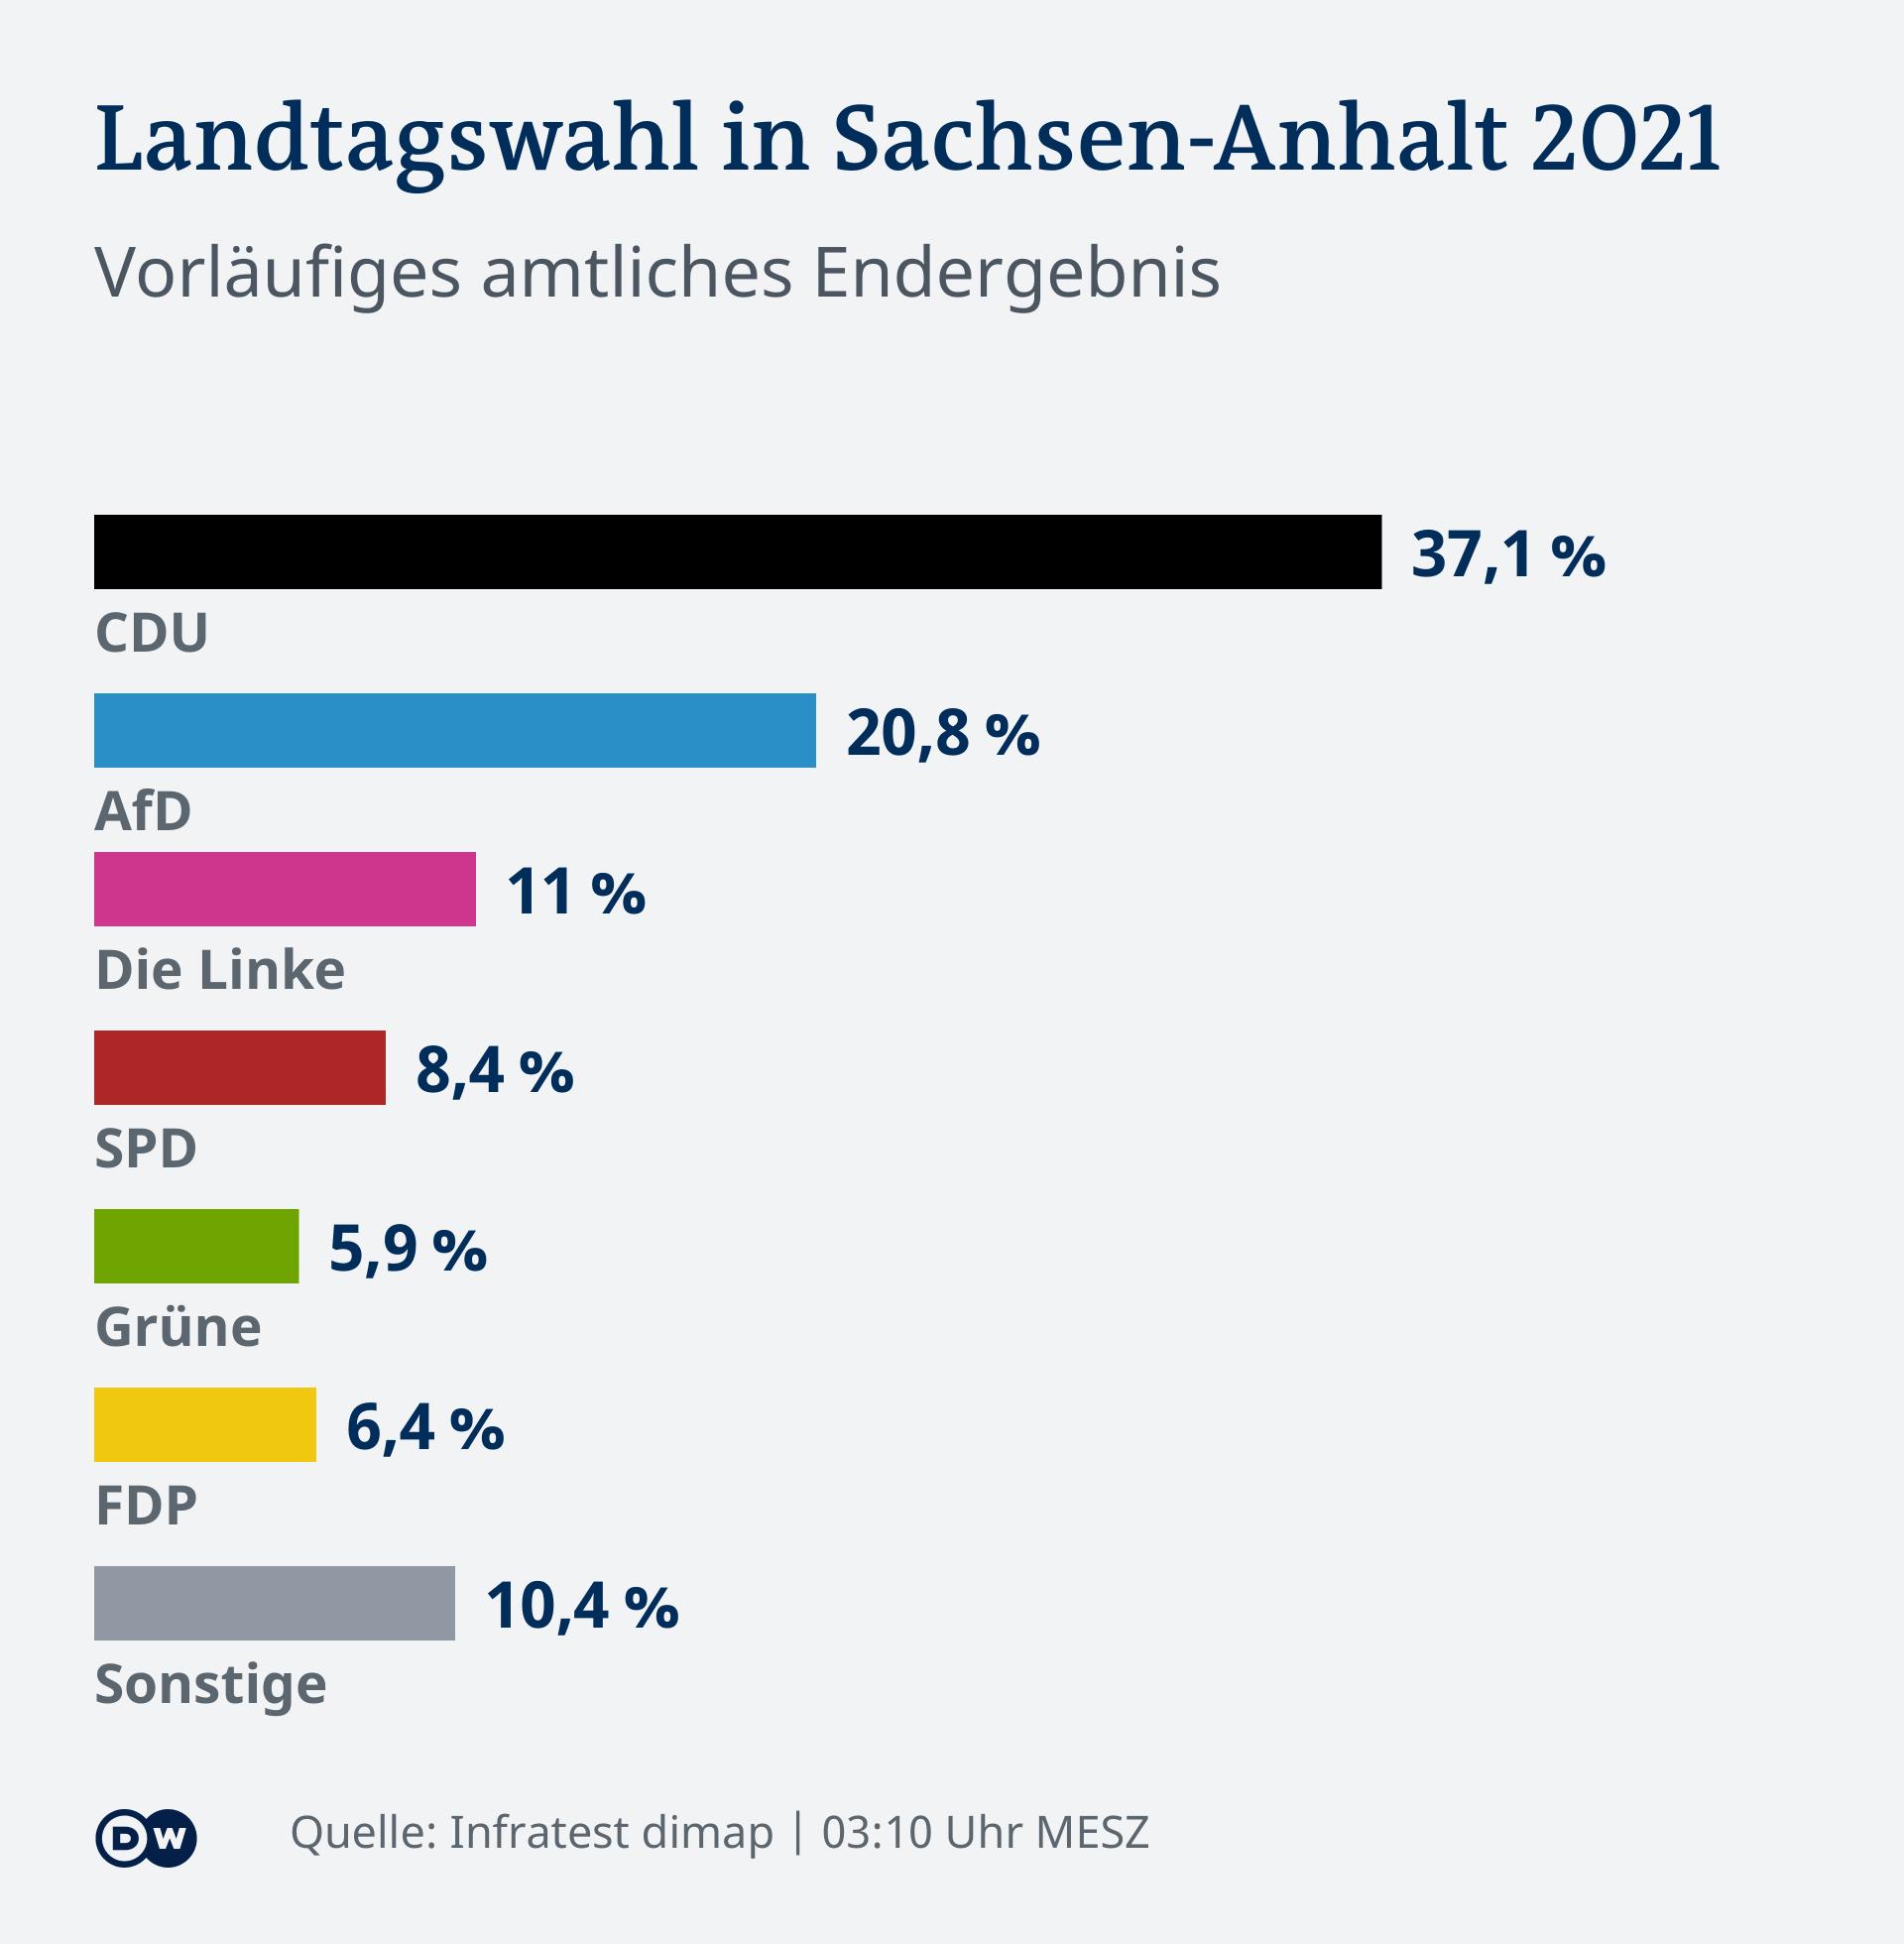 Infografică rezultate alegeri Saxonia-Anhalt